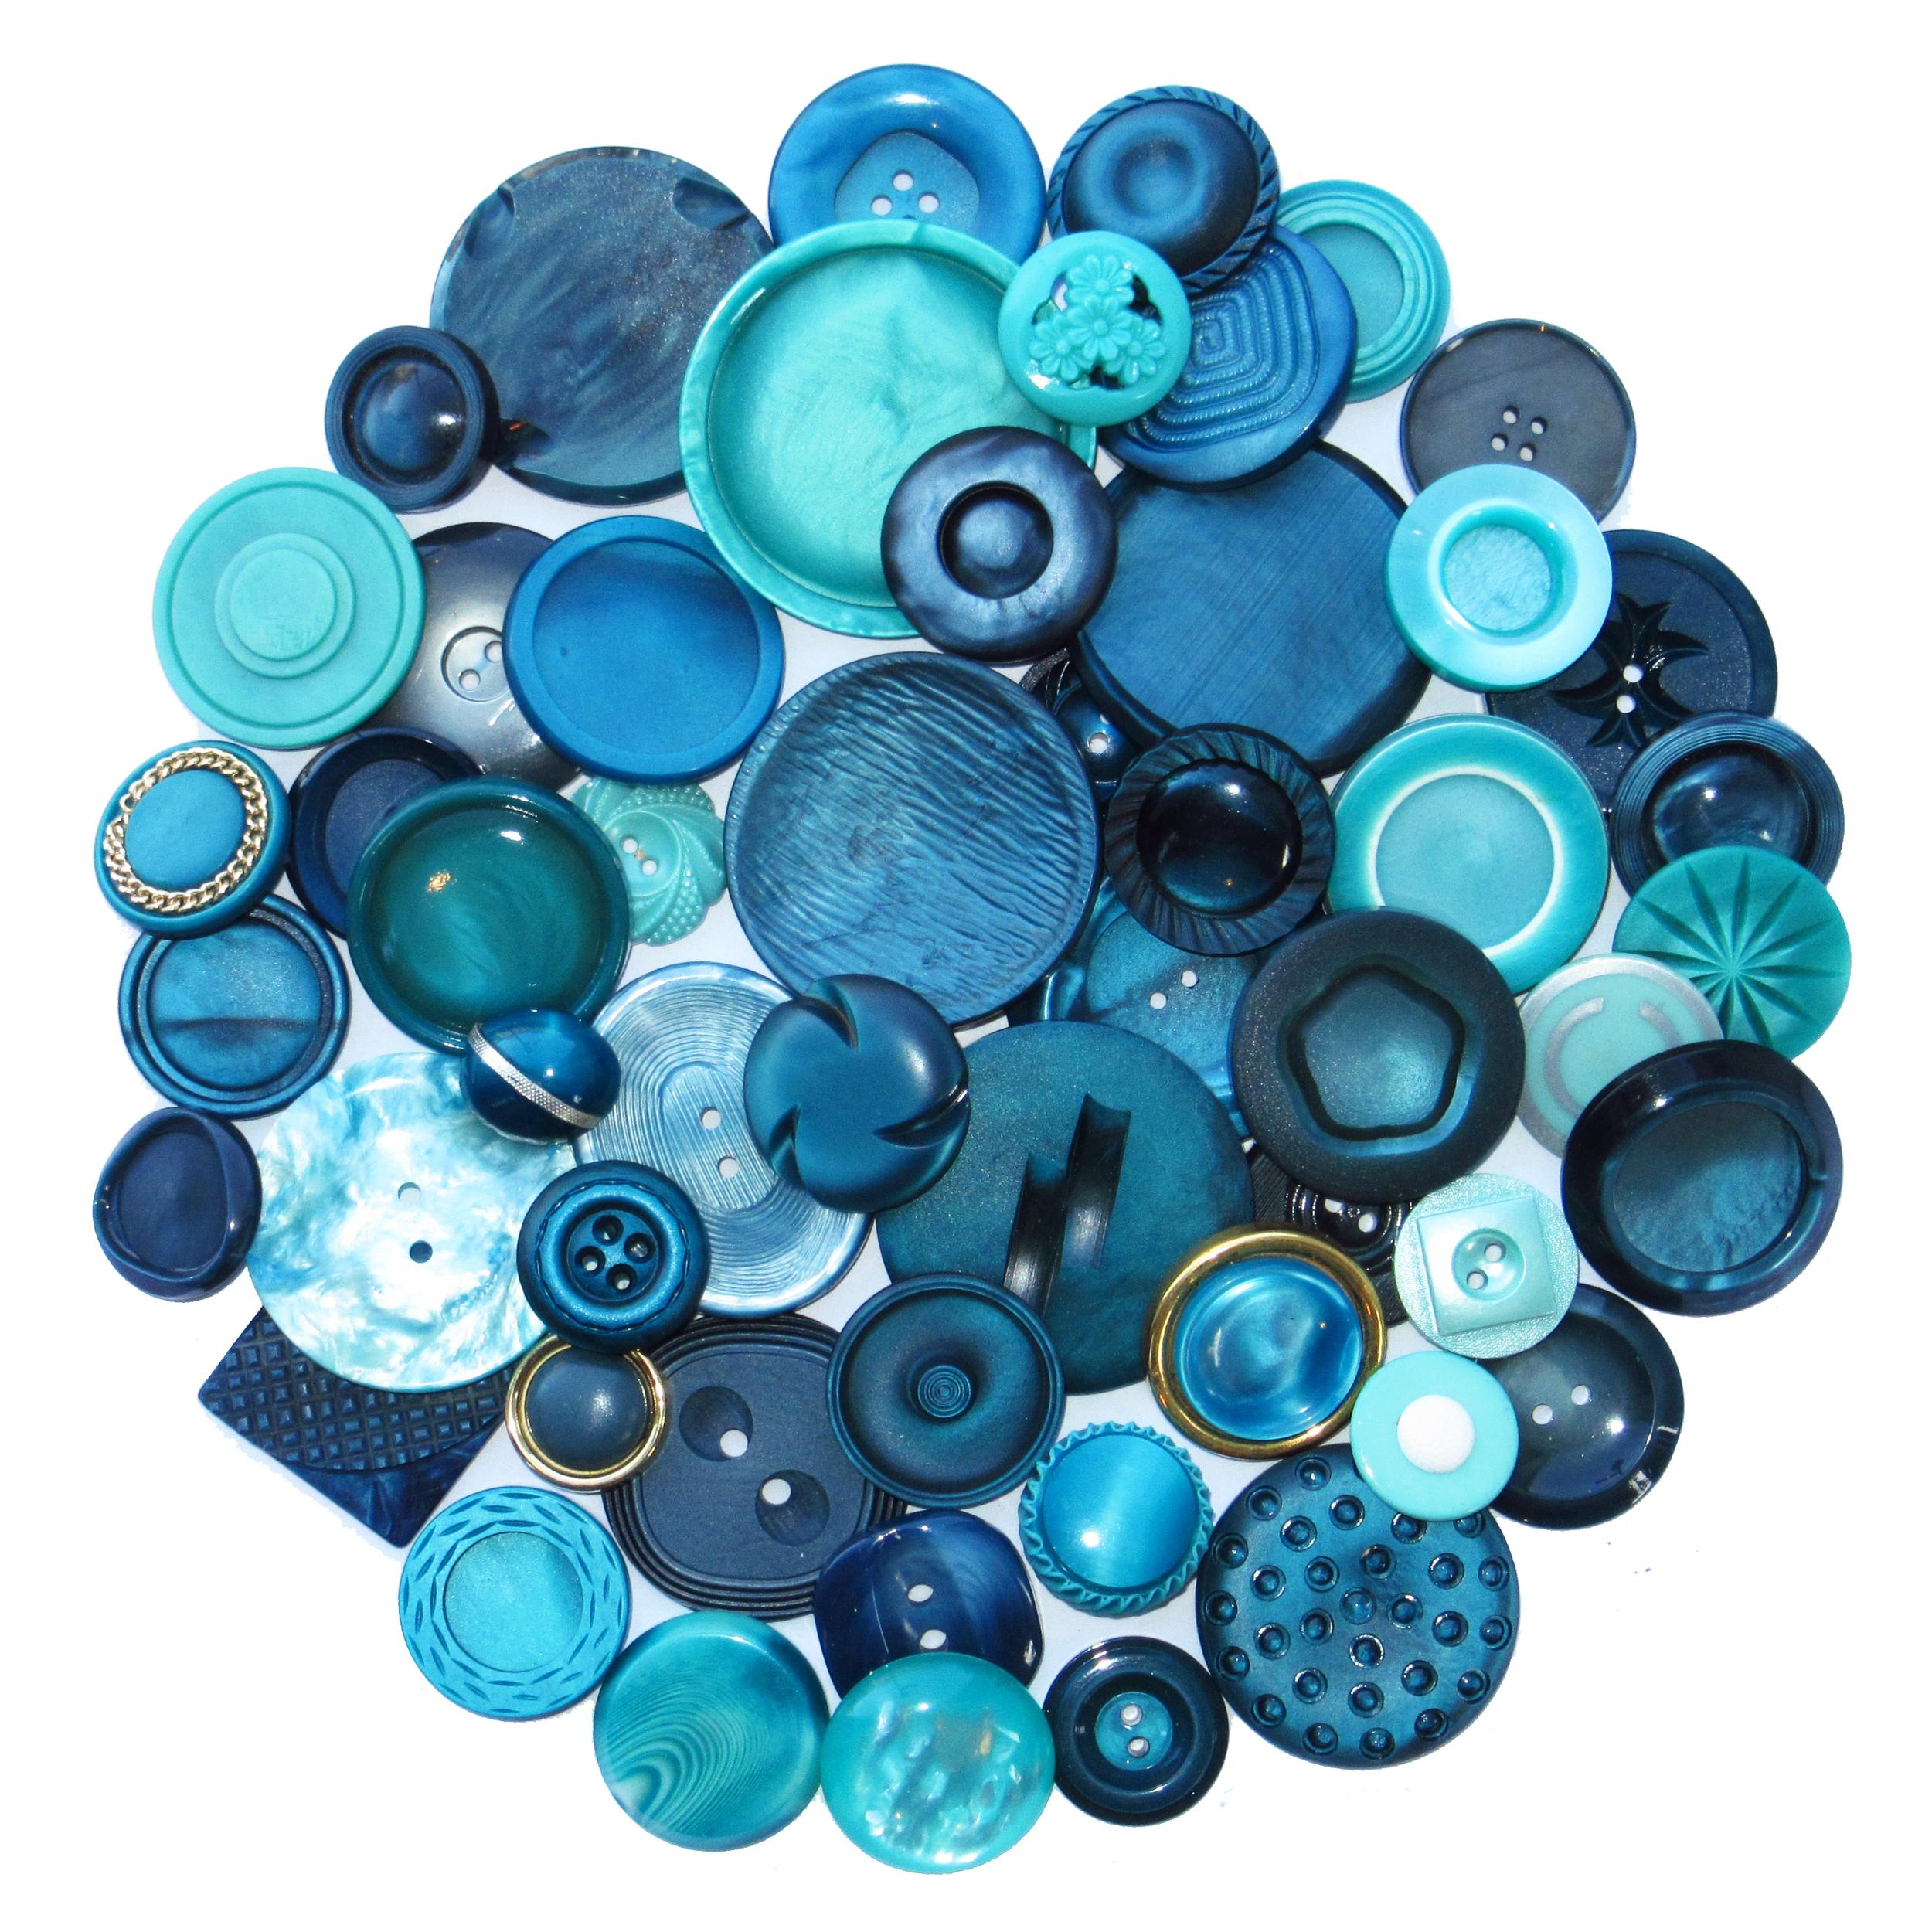 Boutons bleu turquoise